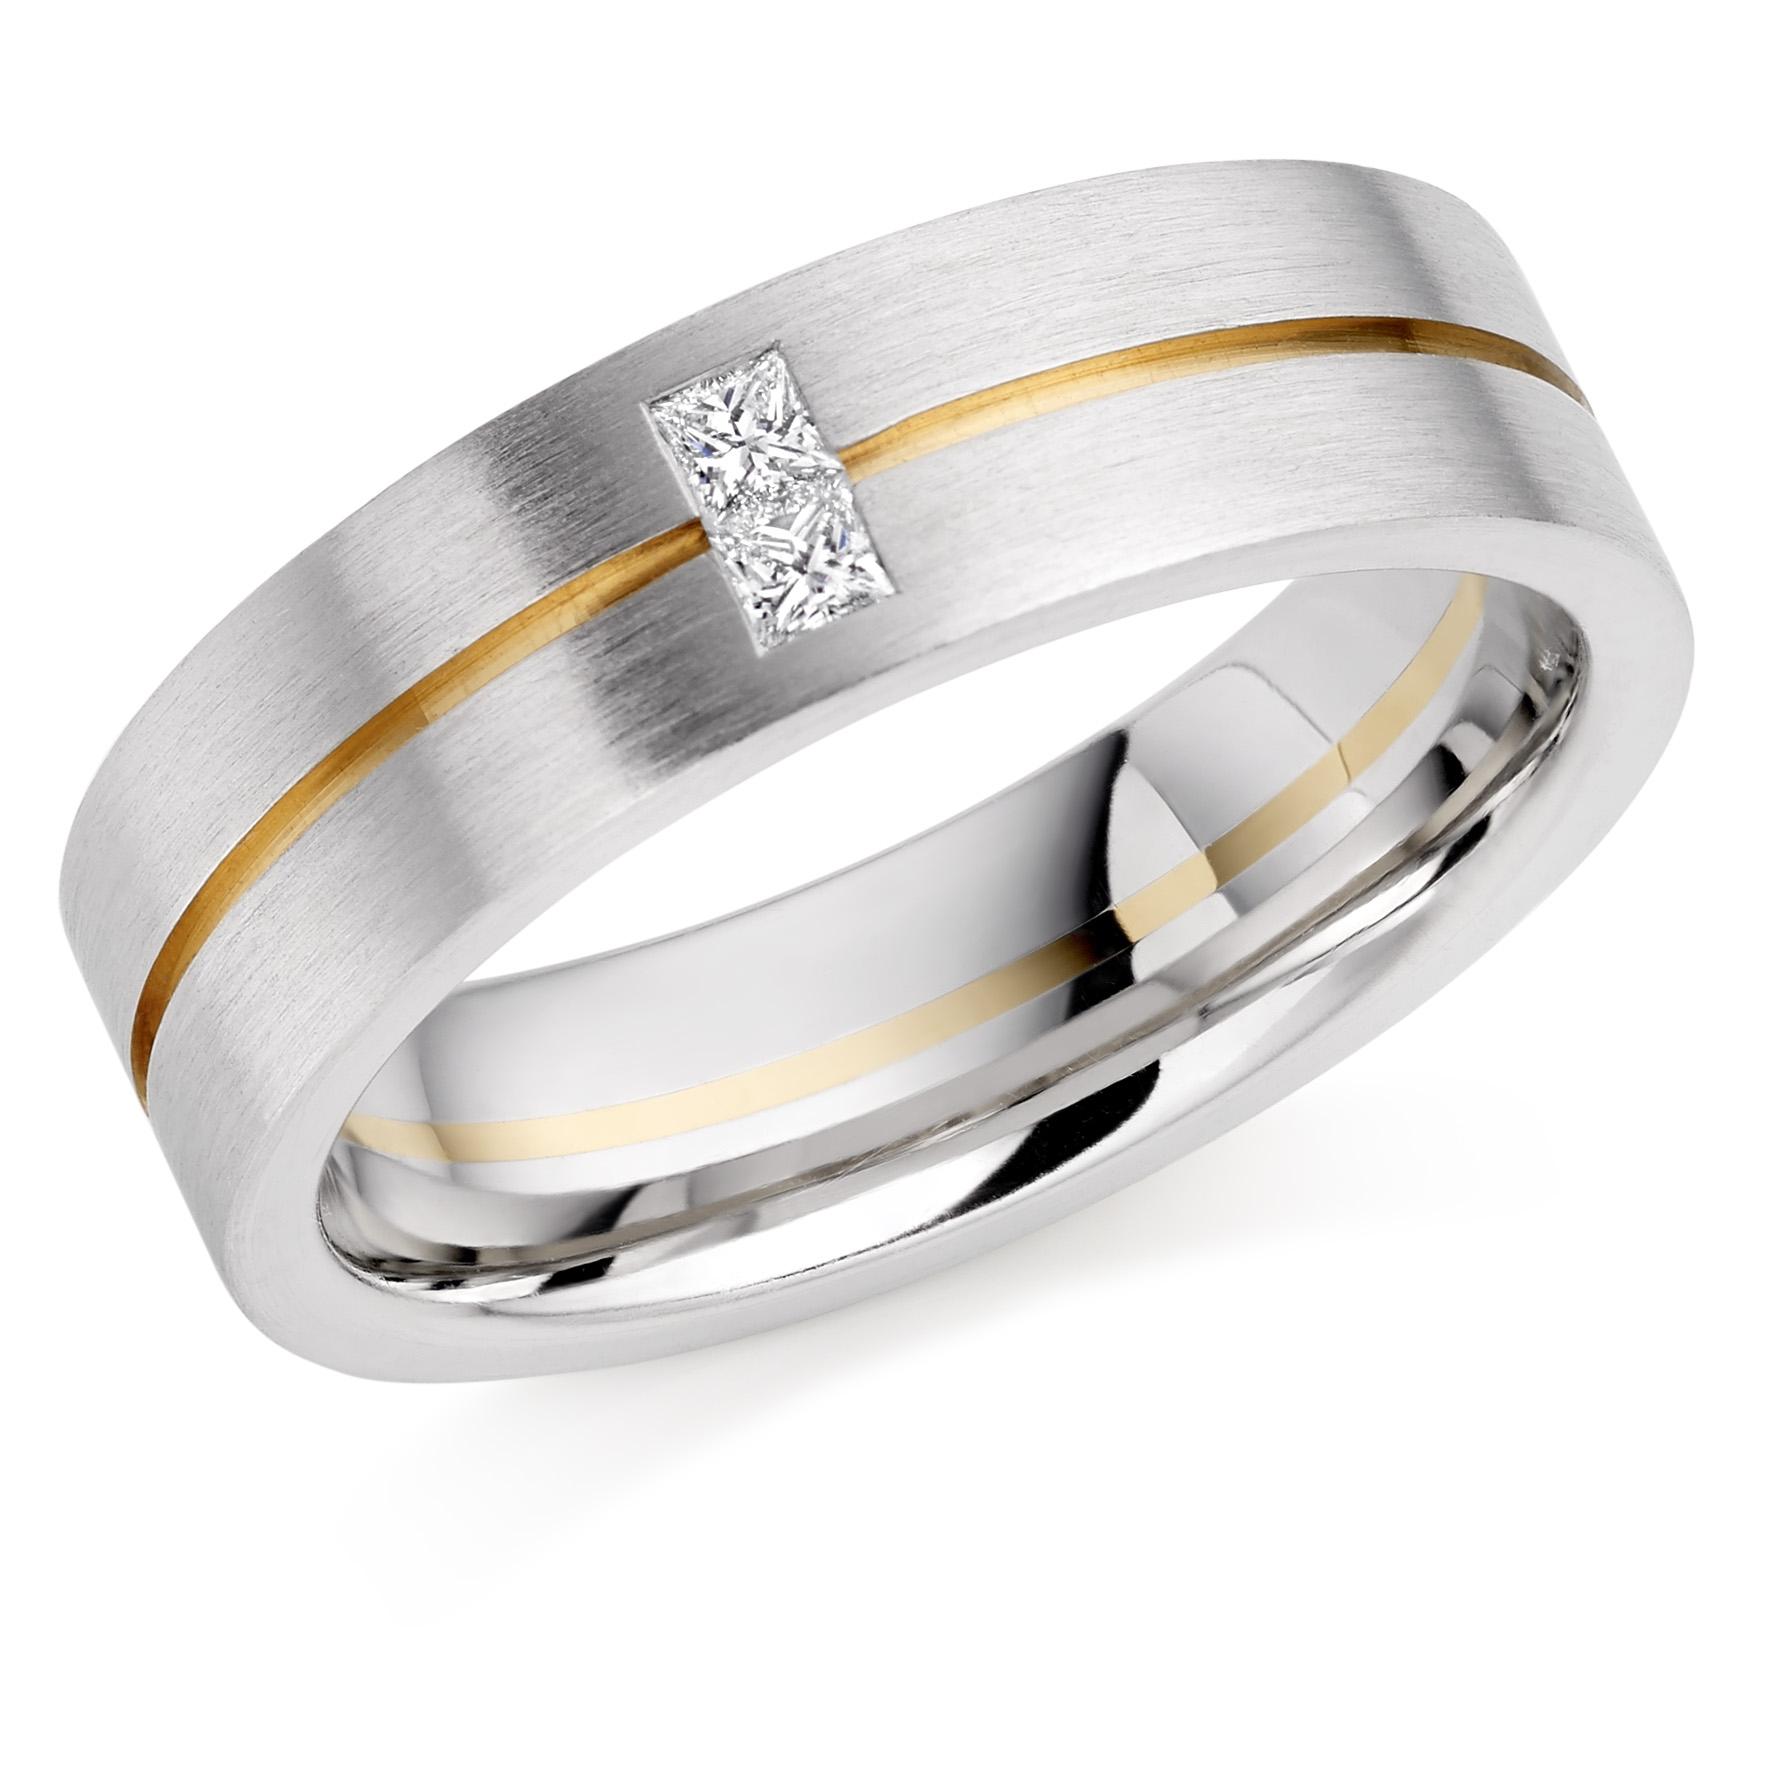 Sintering Technology - Wedding Rings Hatton Garden